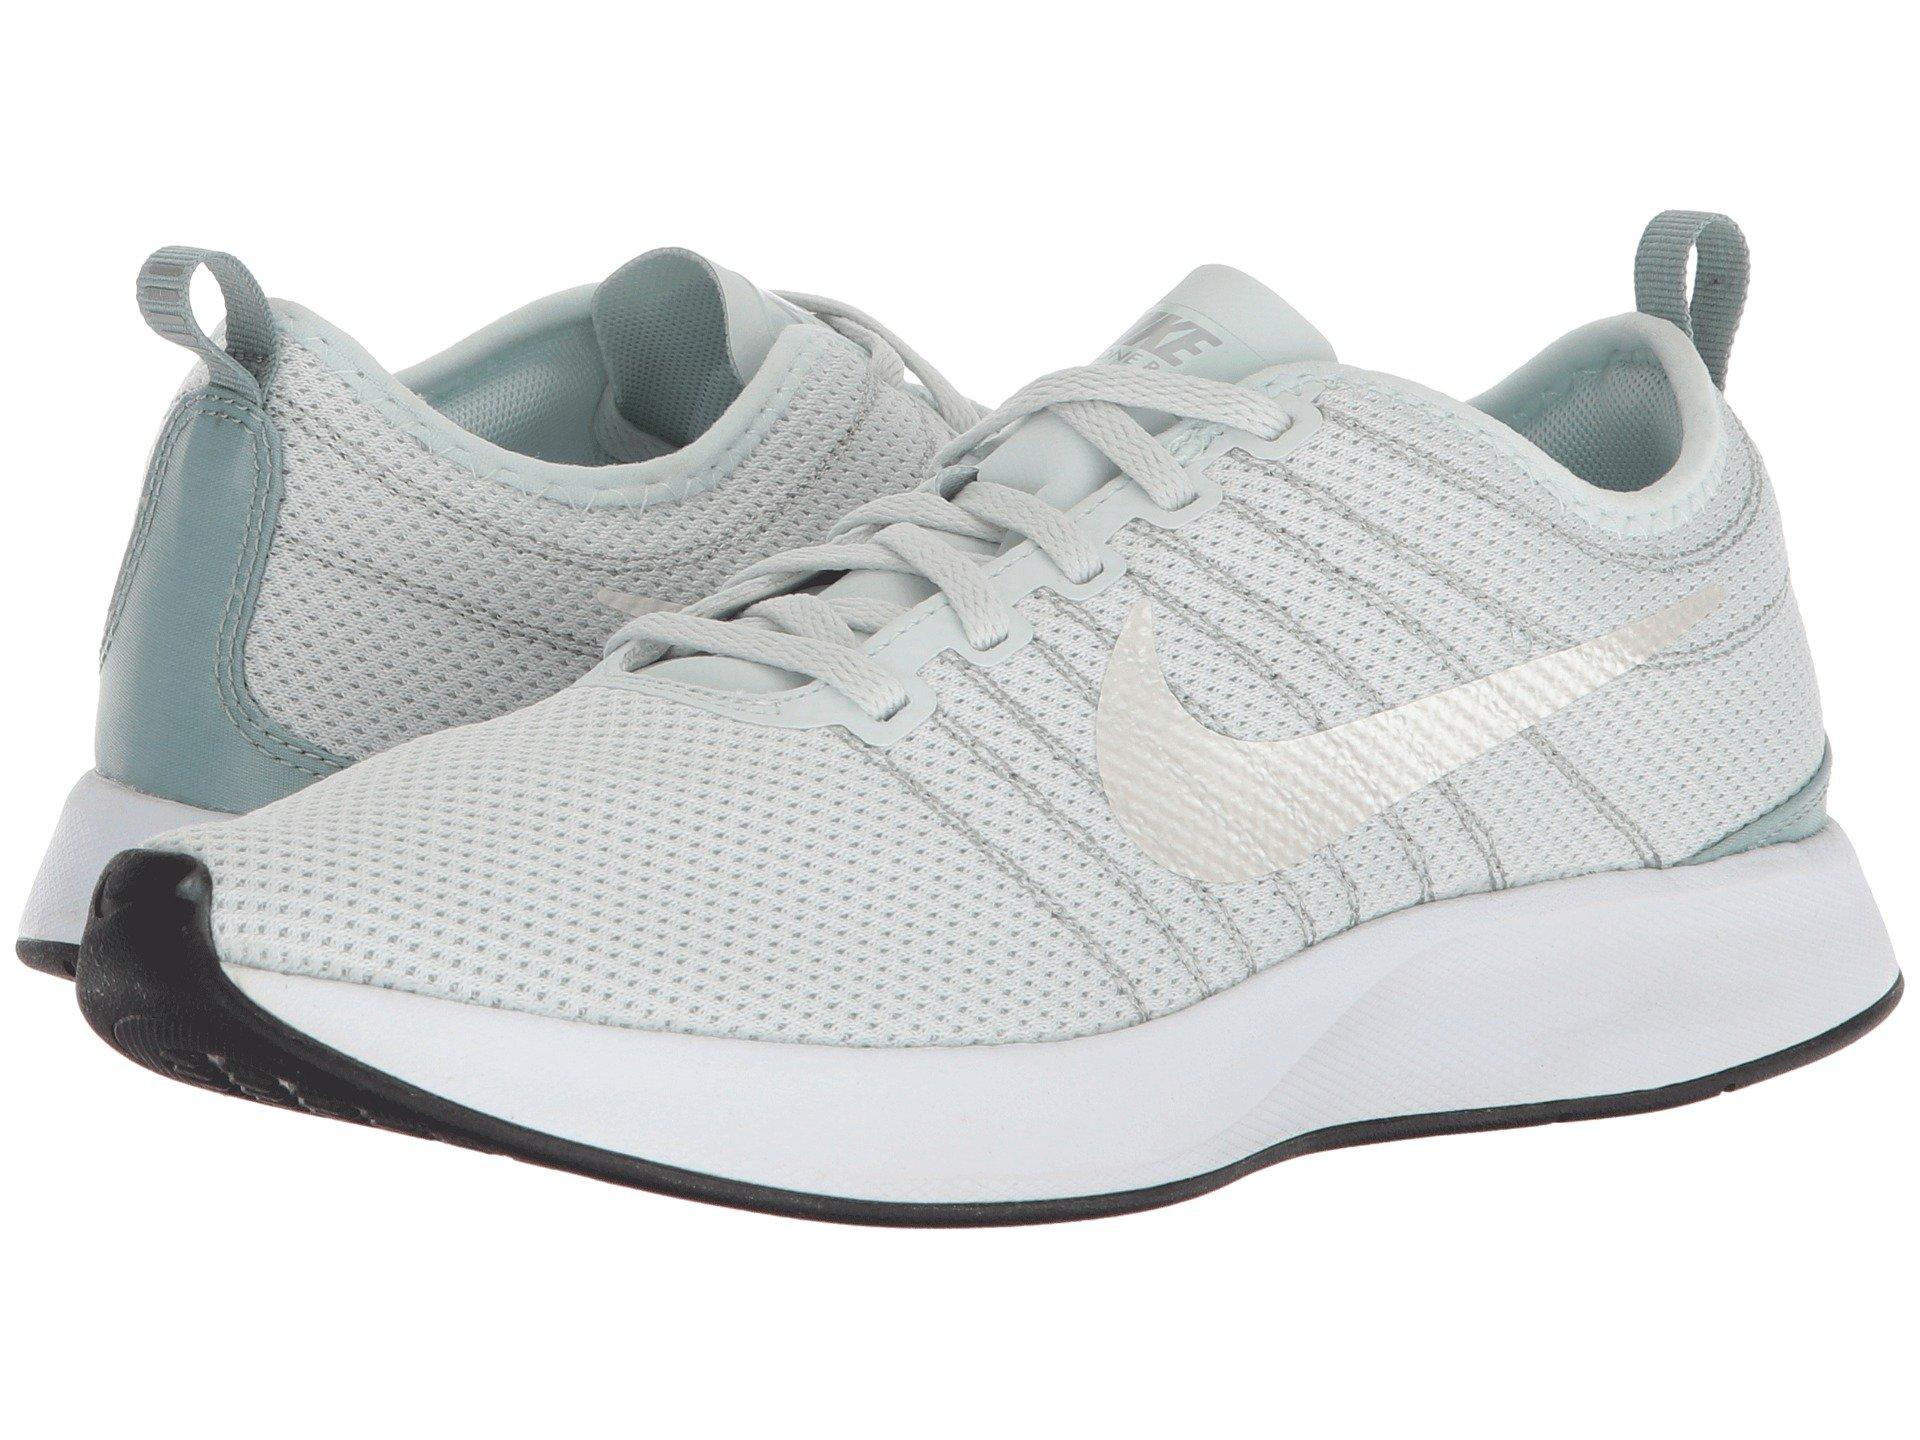 ae1f34f8ca001 Shop Nike Air Max 95 Og Shoes